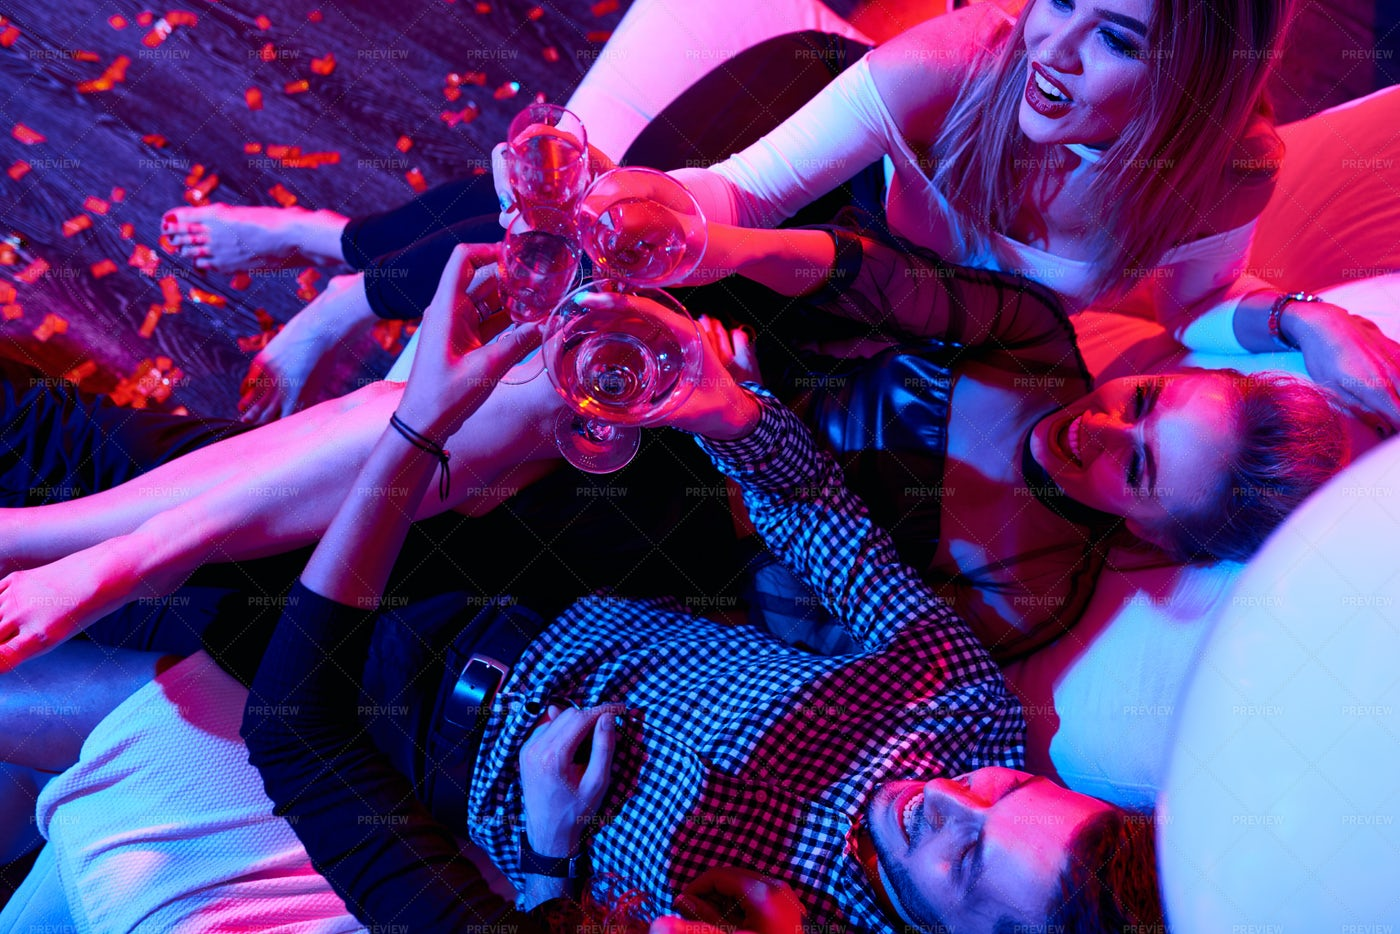 Celebrating Friends Drinking...: Stock Photos